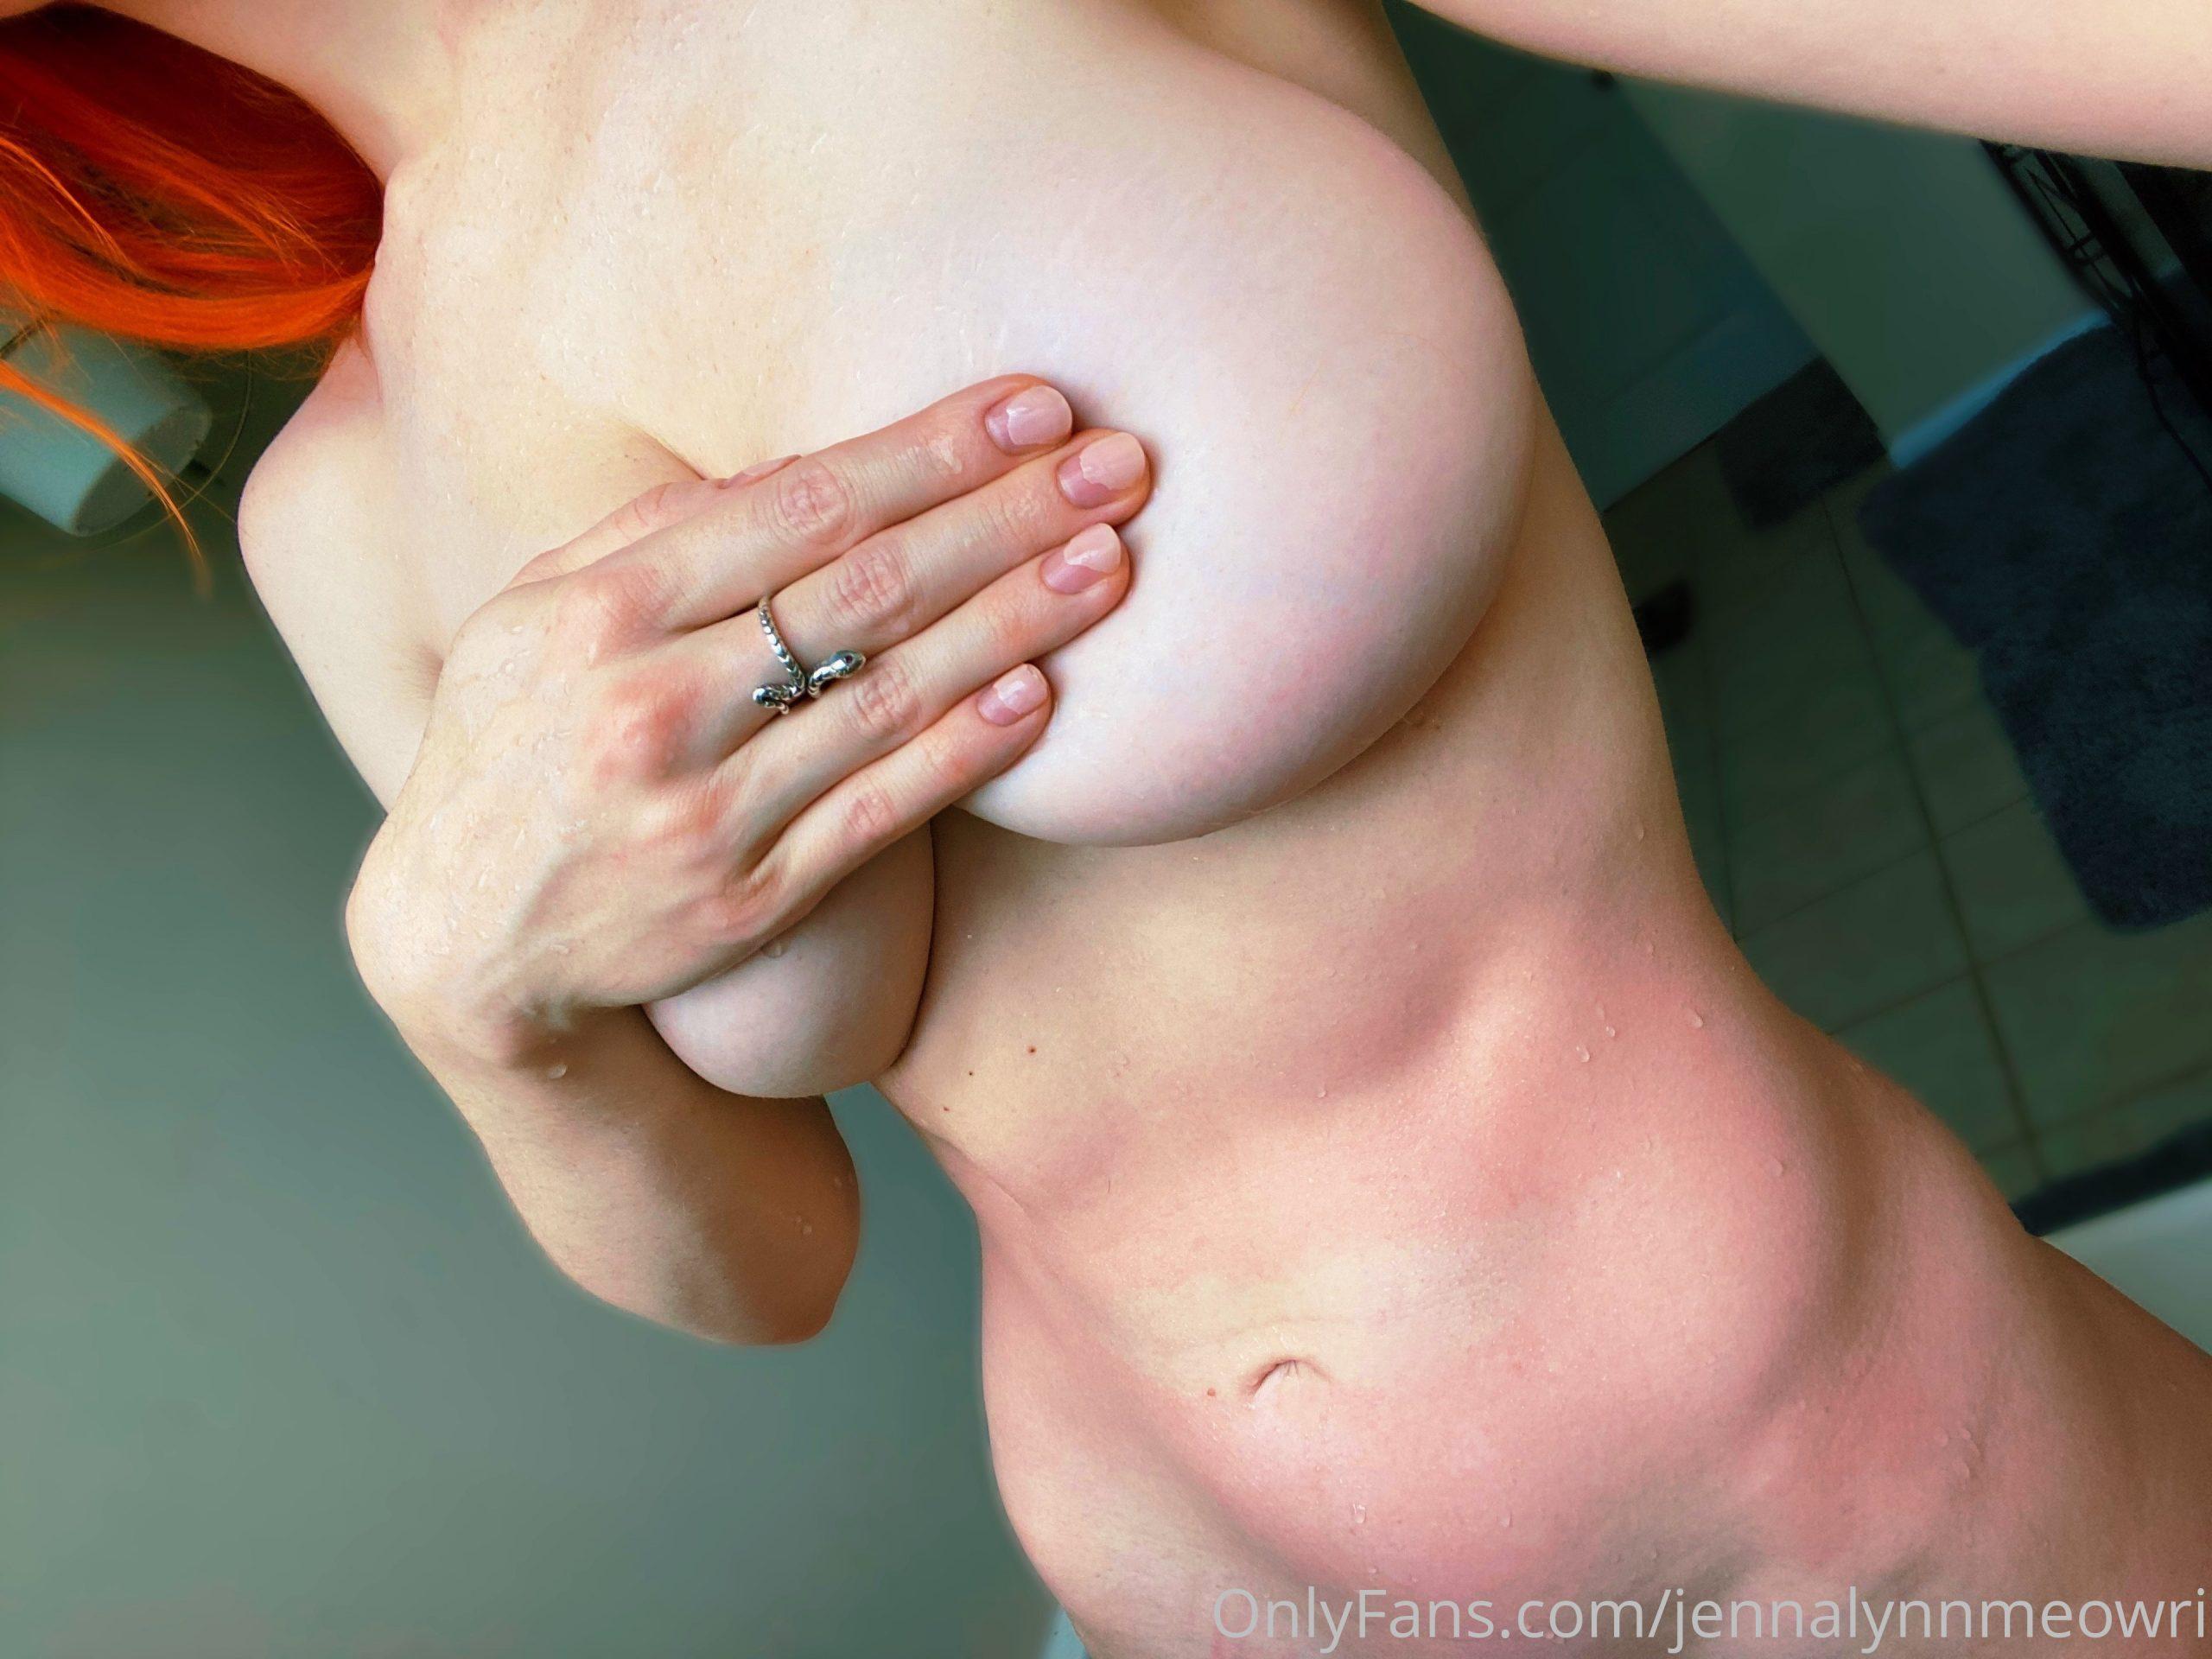 Jenna Lynn Meowri Onlyfans 0023